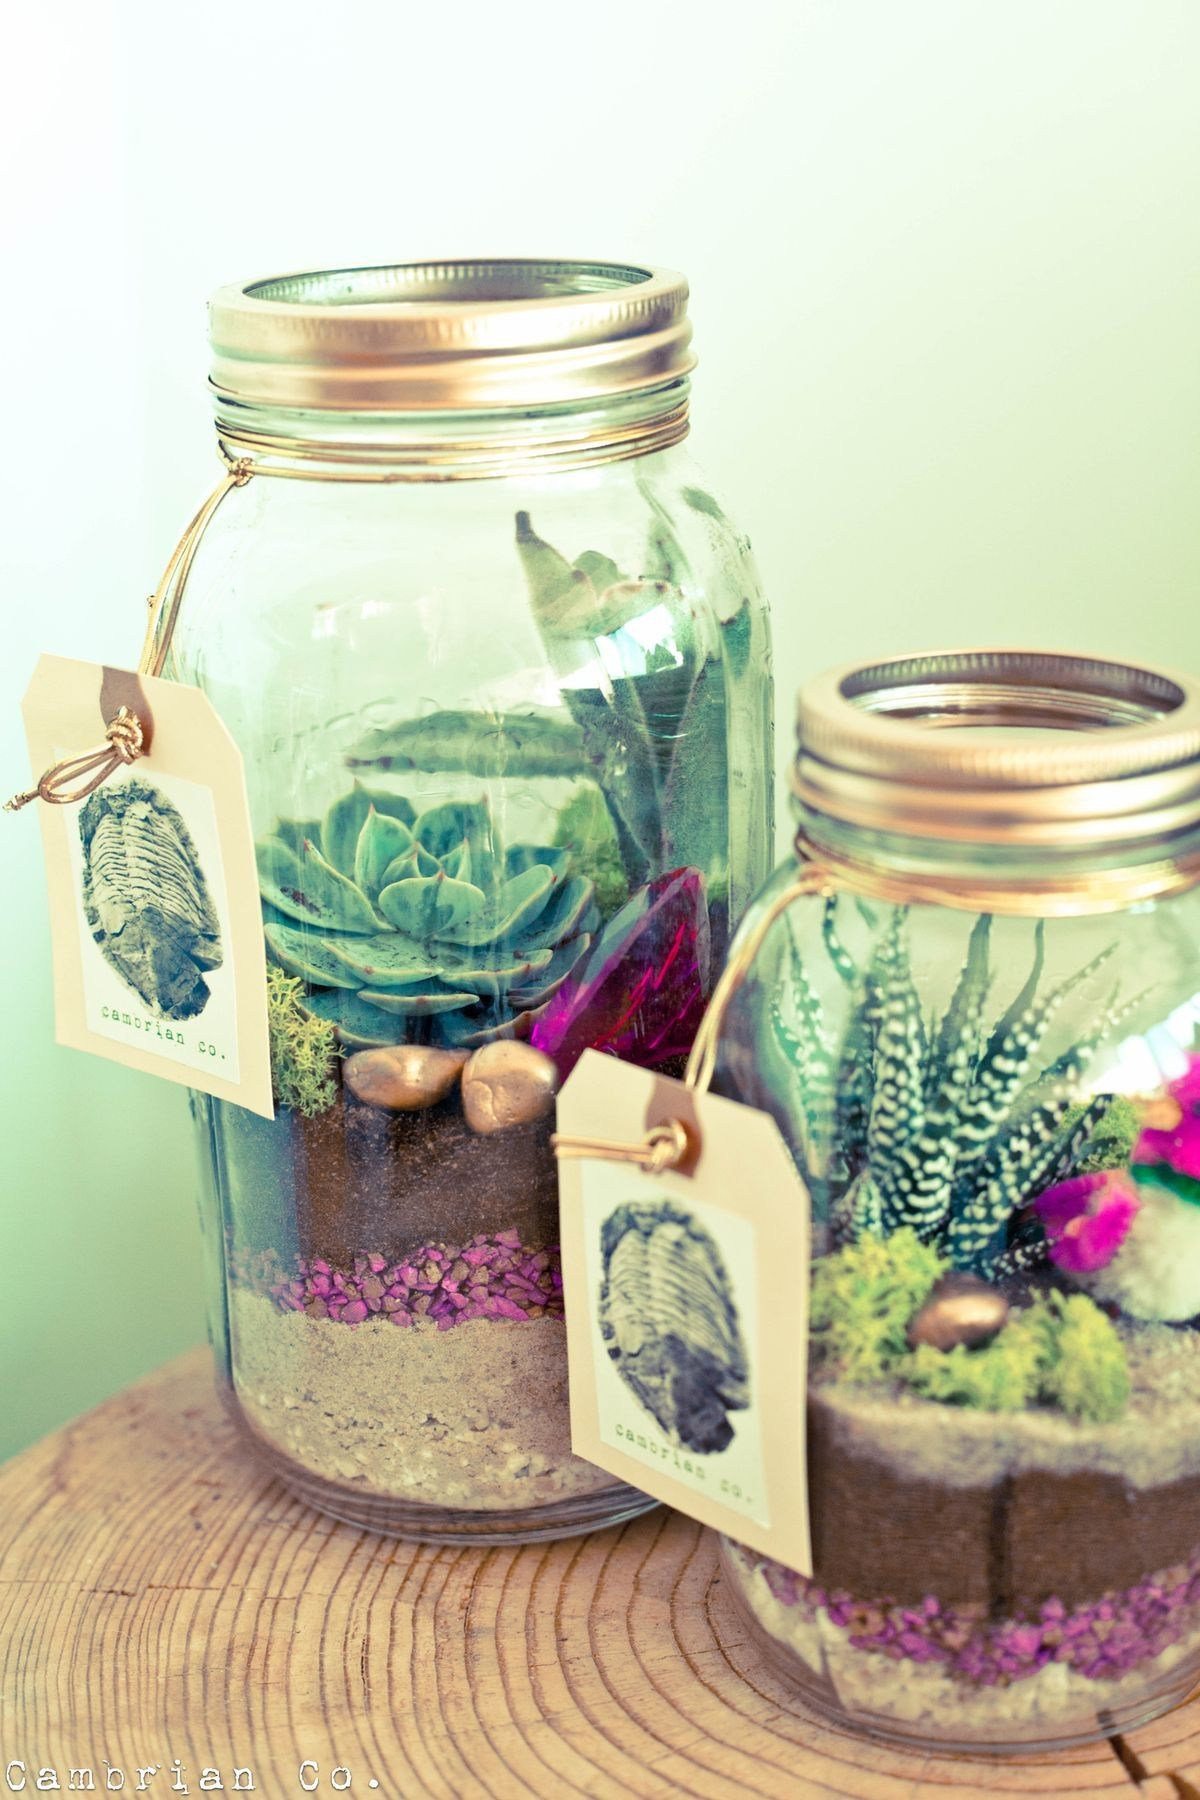 Pin by nuria perez on ideas originales pinterest easy diy gifts